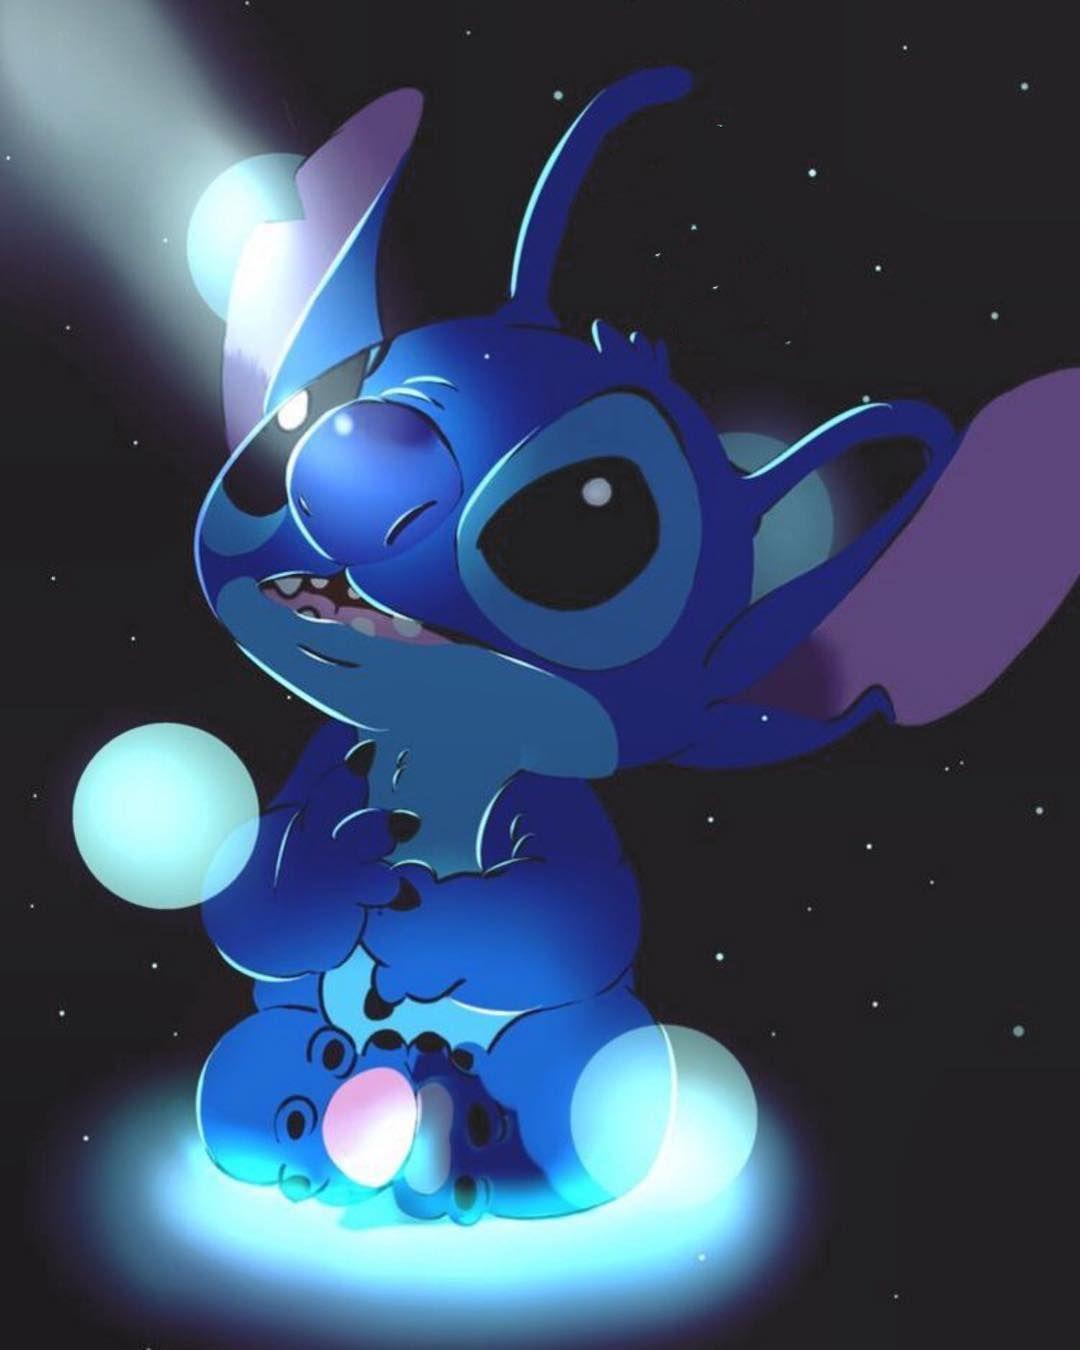 Stitch Disney On Instagram Stitch Stitchartwork